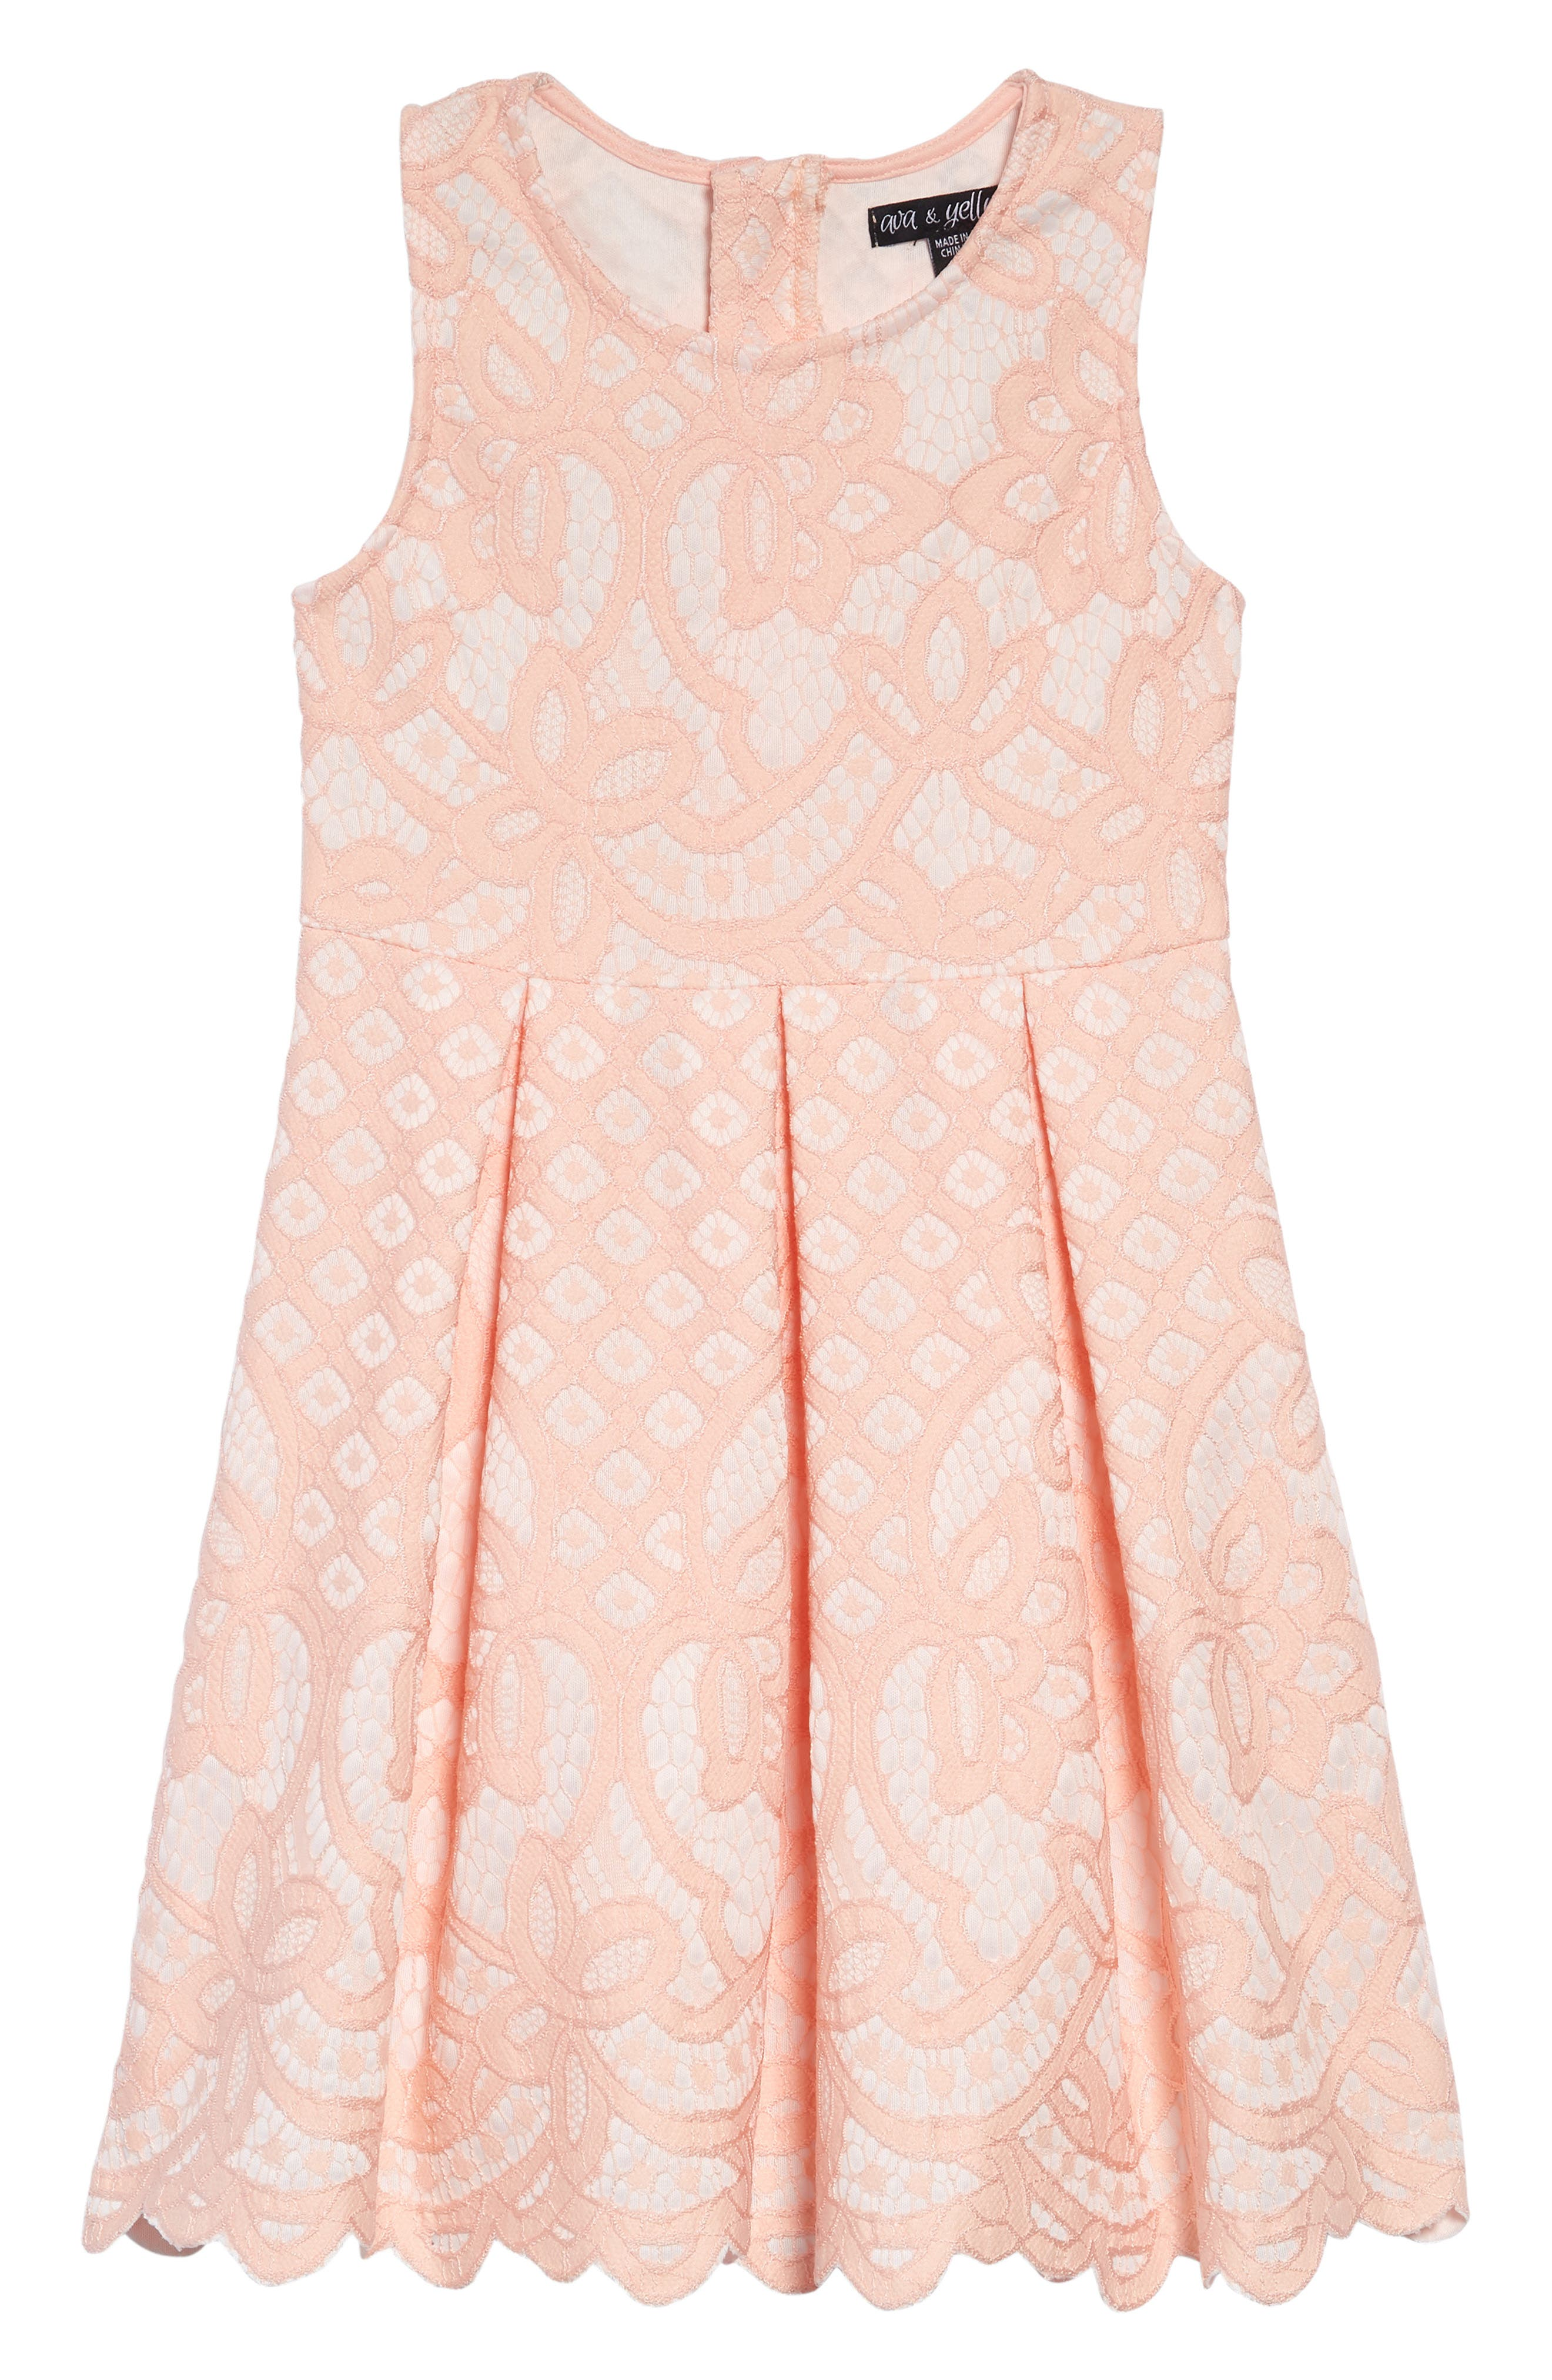 Two Tone Lace Dress,                         Main,                         color, 681